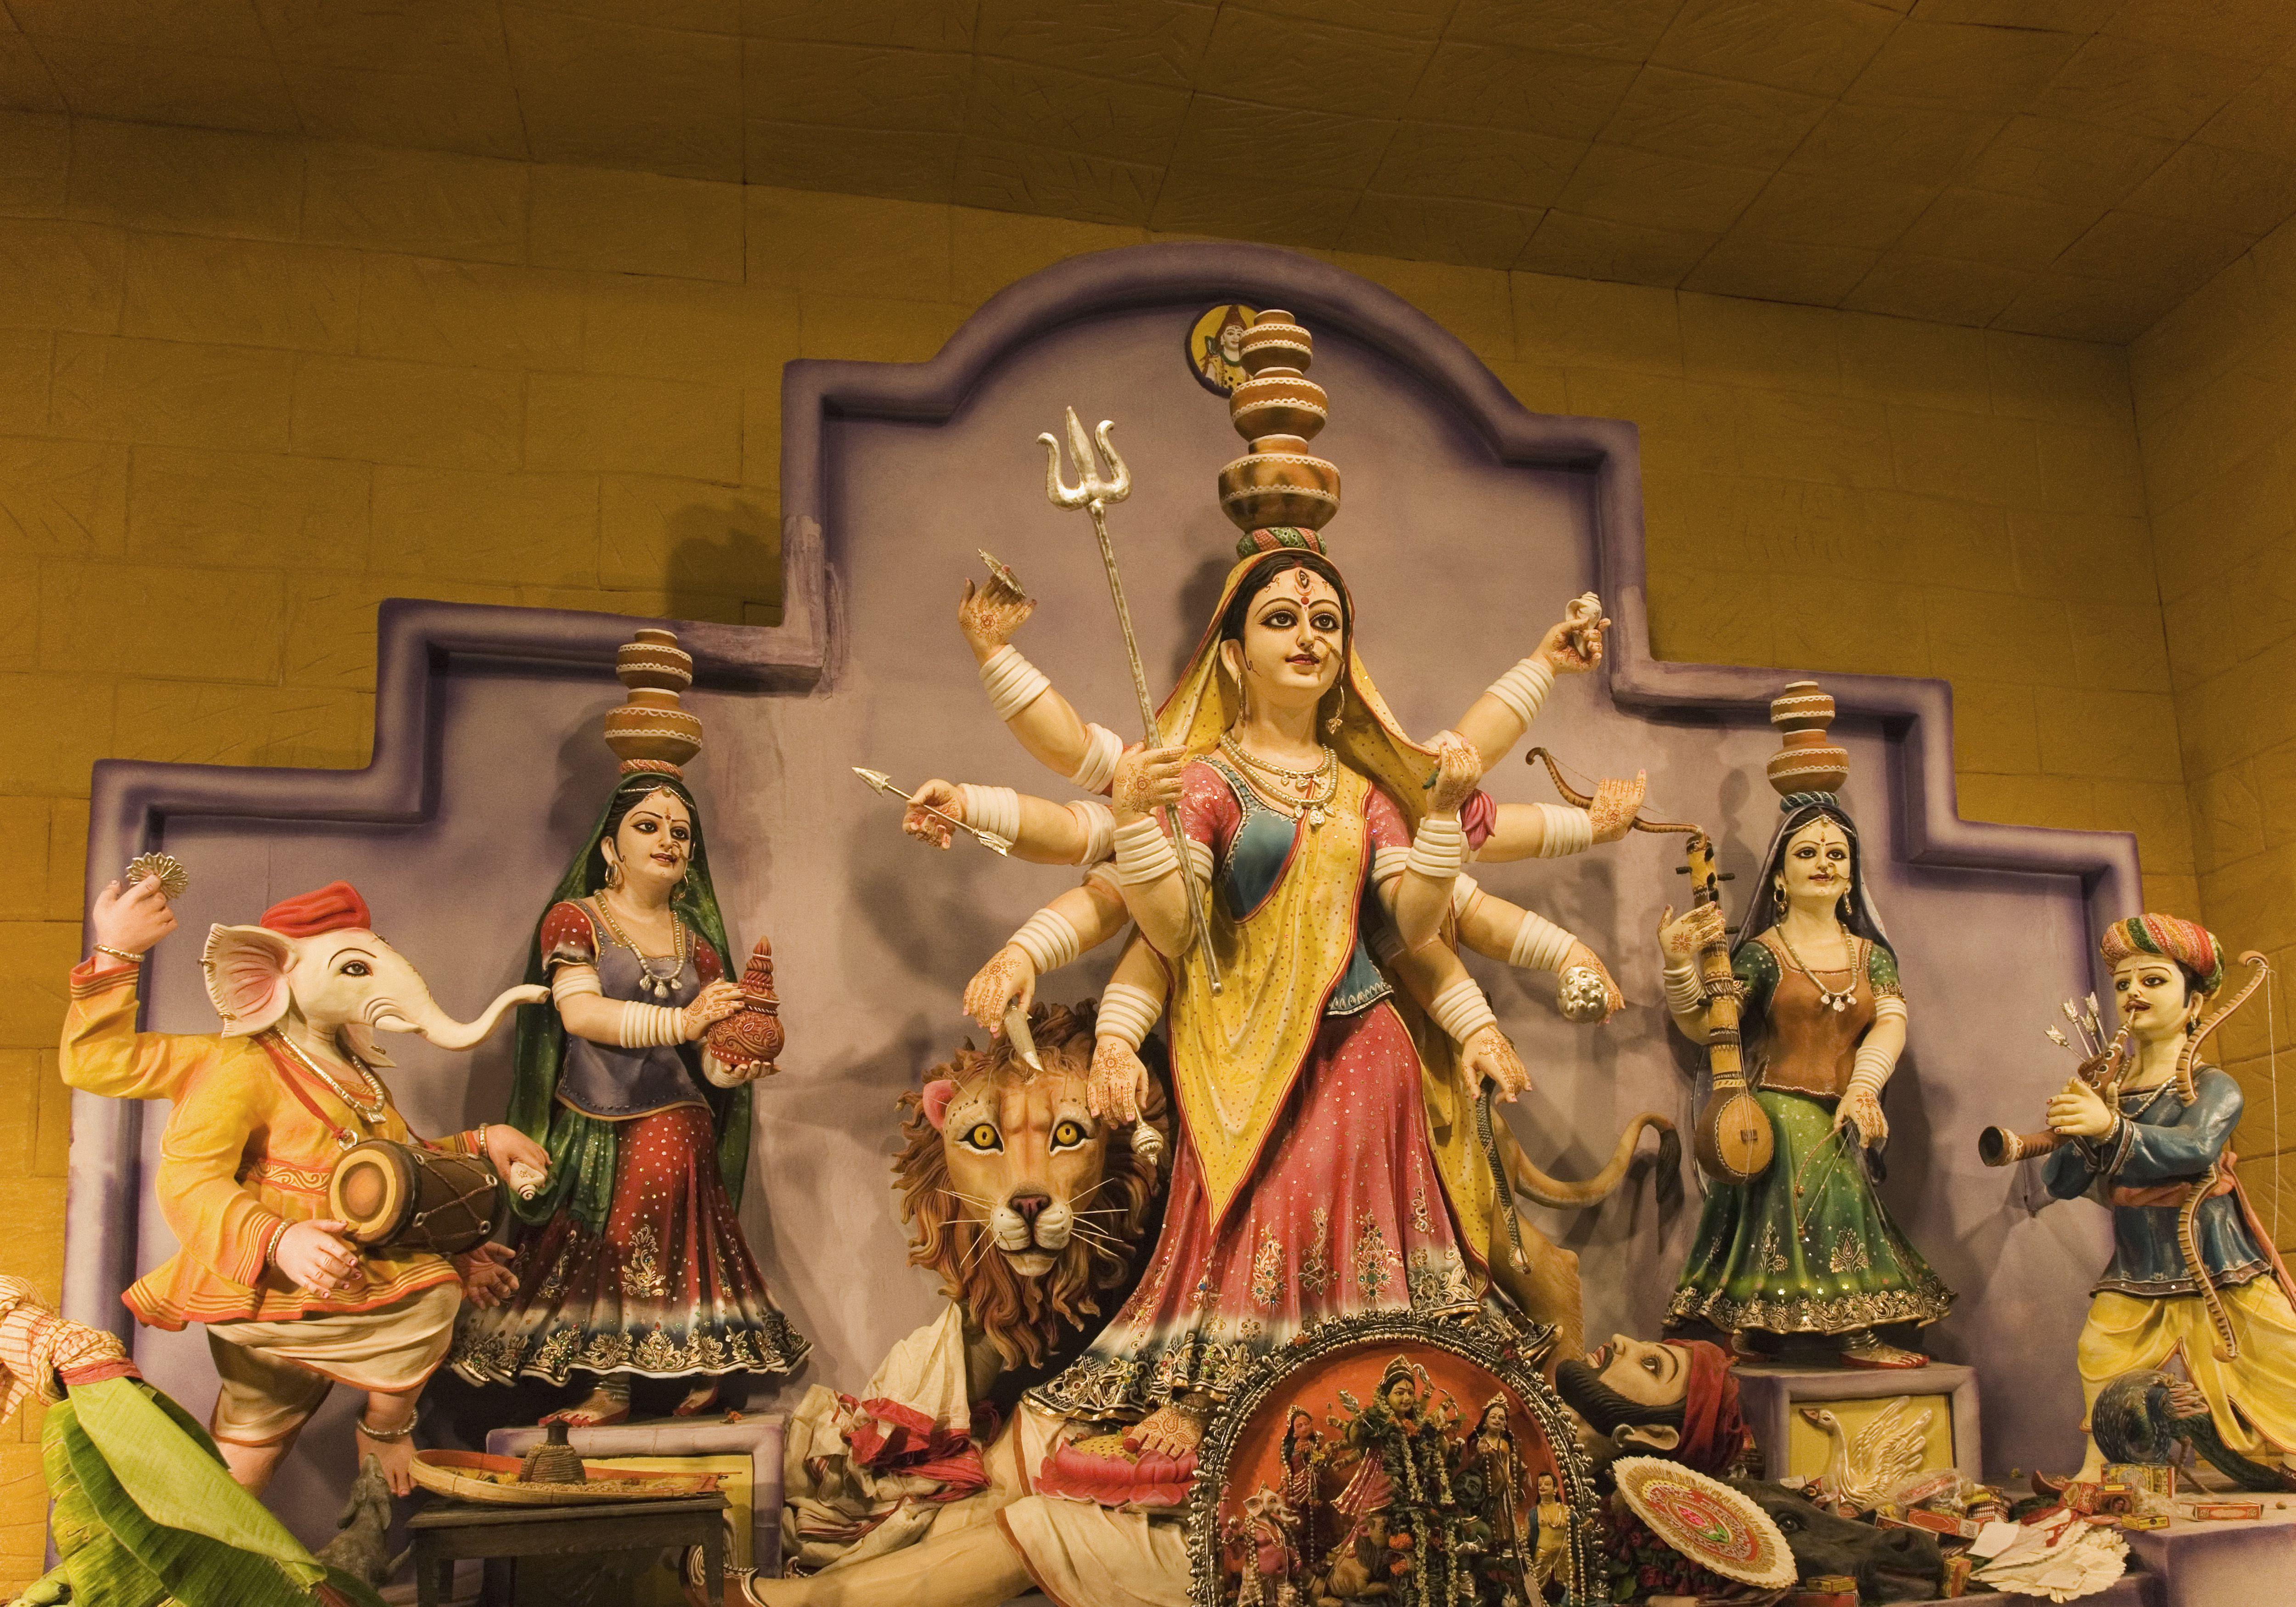 Navadurga and the 9 Forms of the Hindu Goddess Durga